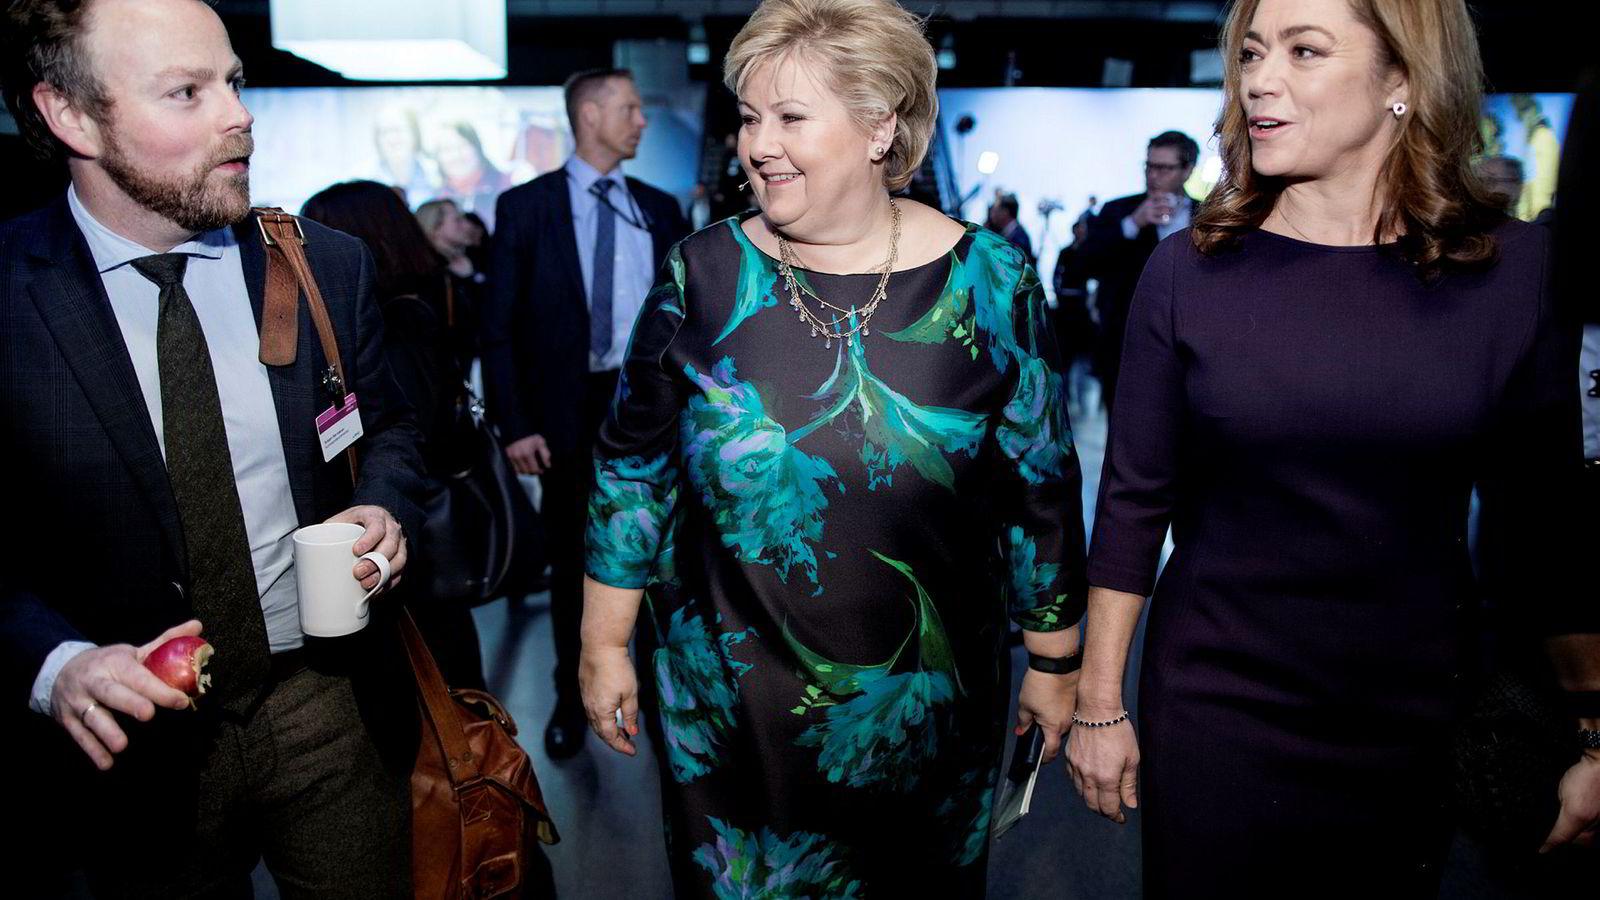 Erna Solberg er uenig med sin partifelle, stortingsrepresentant Heidi Nordby Lunde, som vil kutte i sykelønnen. NHO, her ved direktør Kristin Skogen Lund (til høyre), støtter imidlertid Lunde. Her er de med næringsminister Torbjørn Røe Isaksen under NHOs årskonferanse tidligere i år.